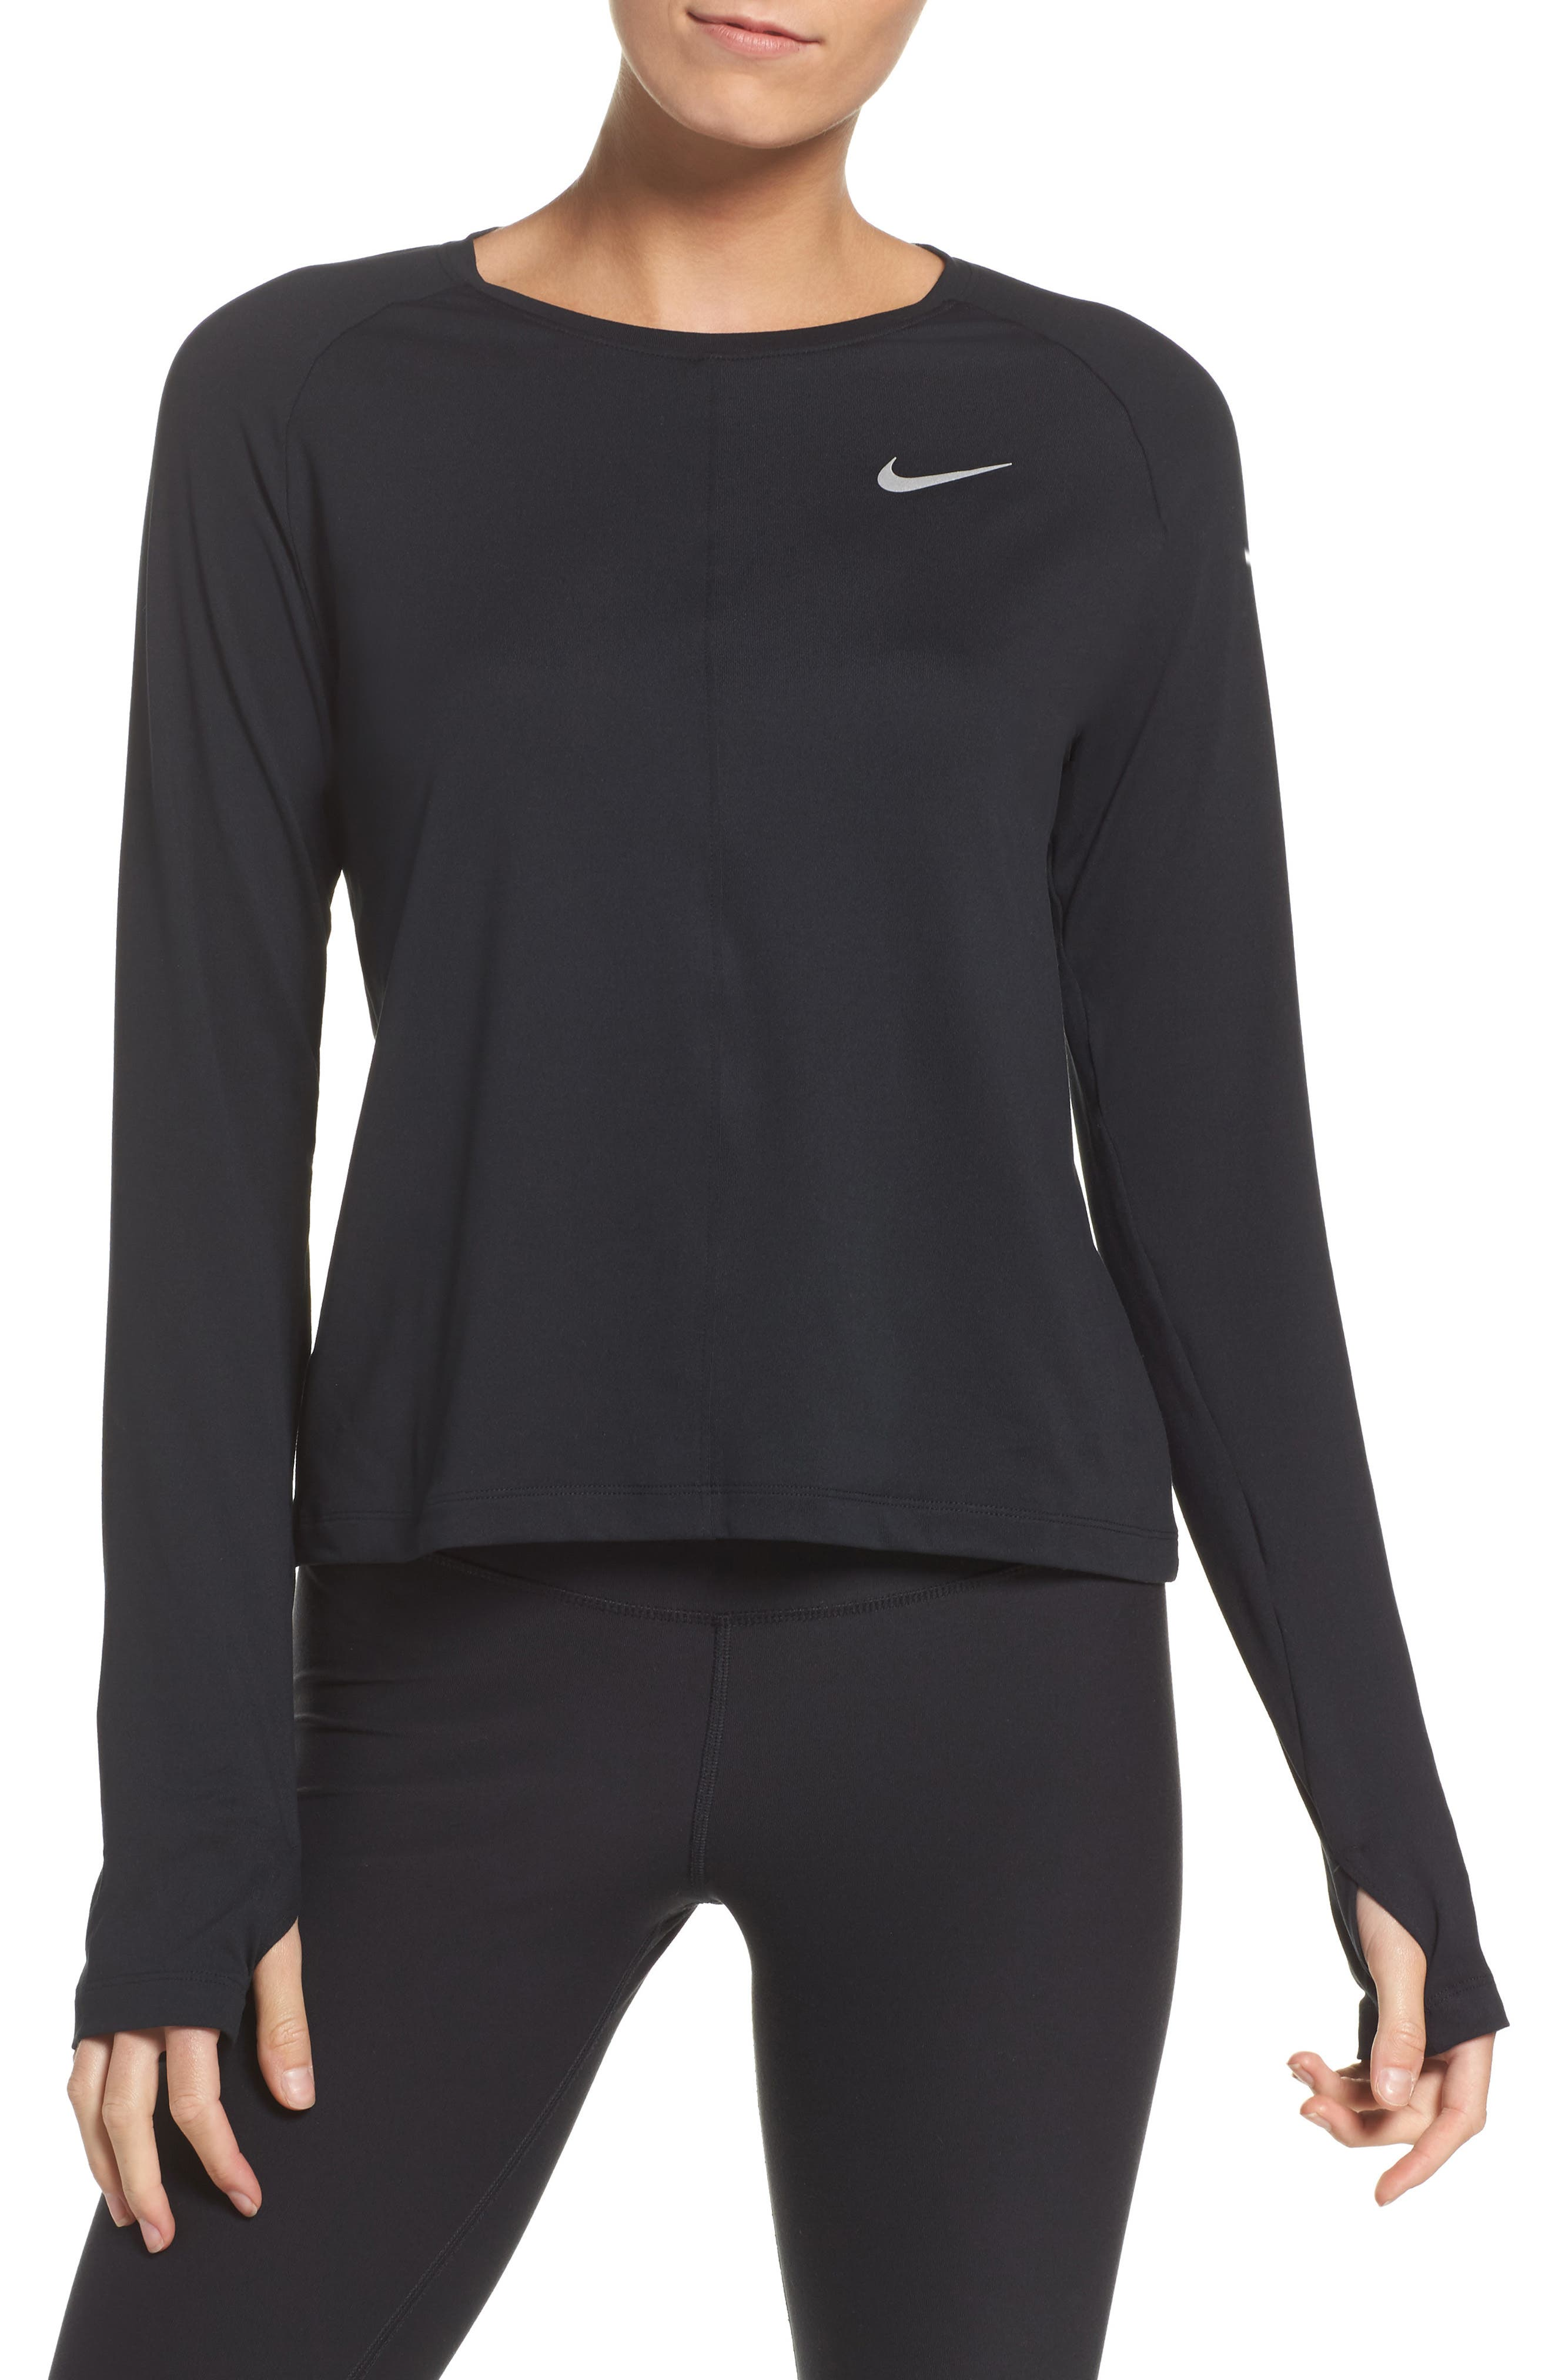 Alternate Image 1 Selected - Nike Dry Element Crop Top